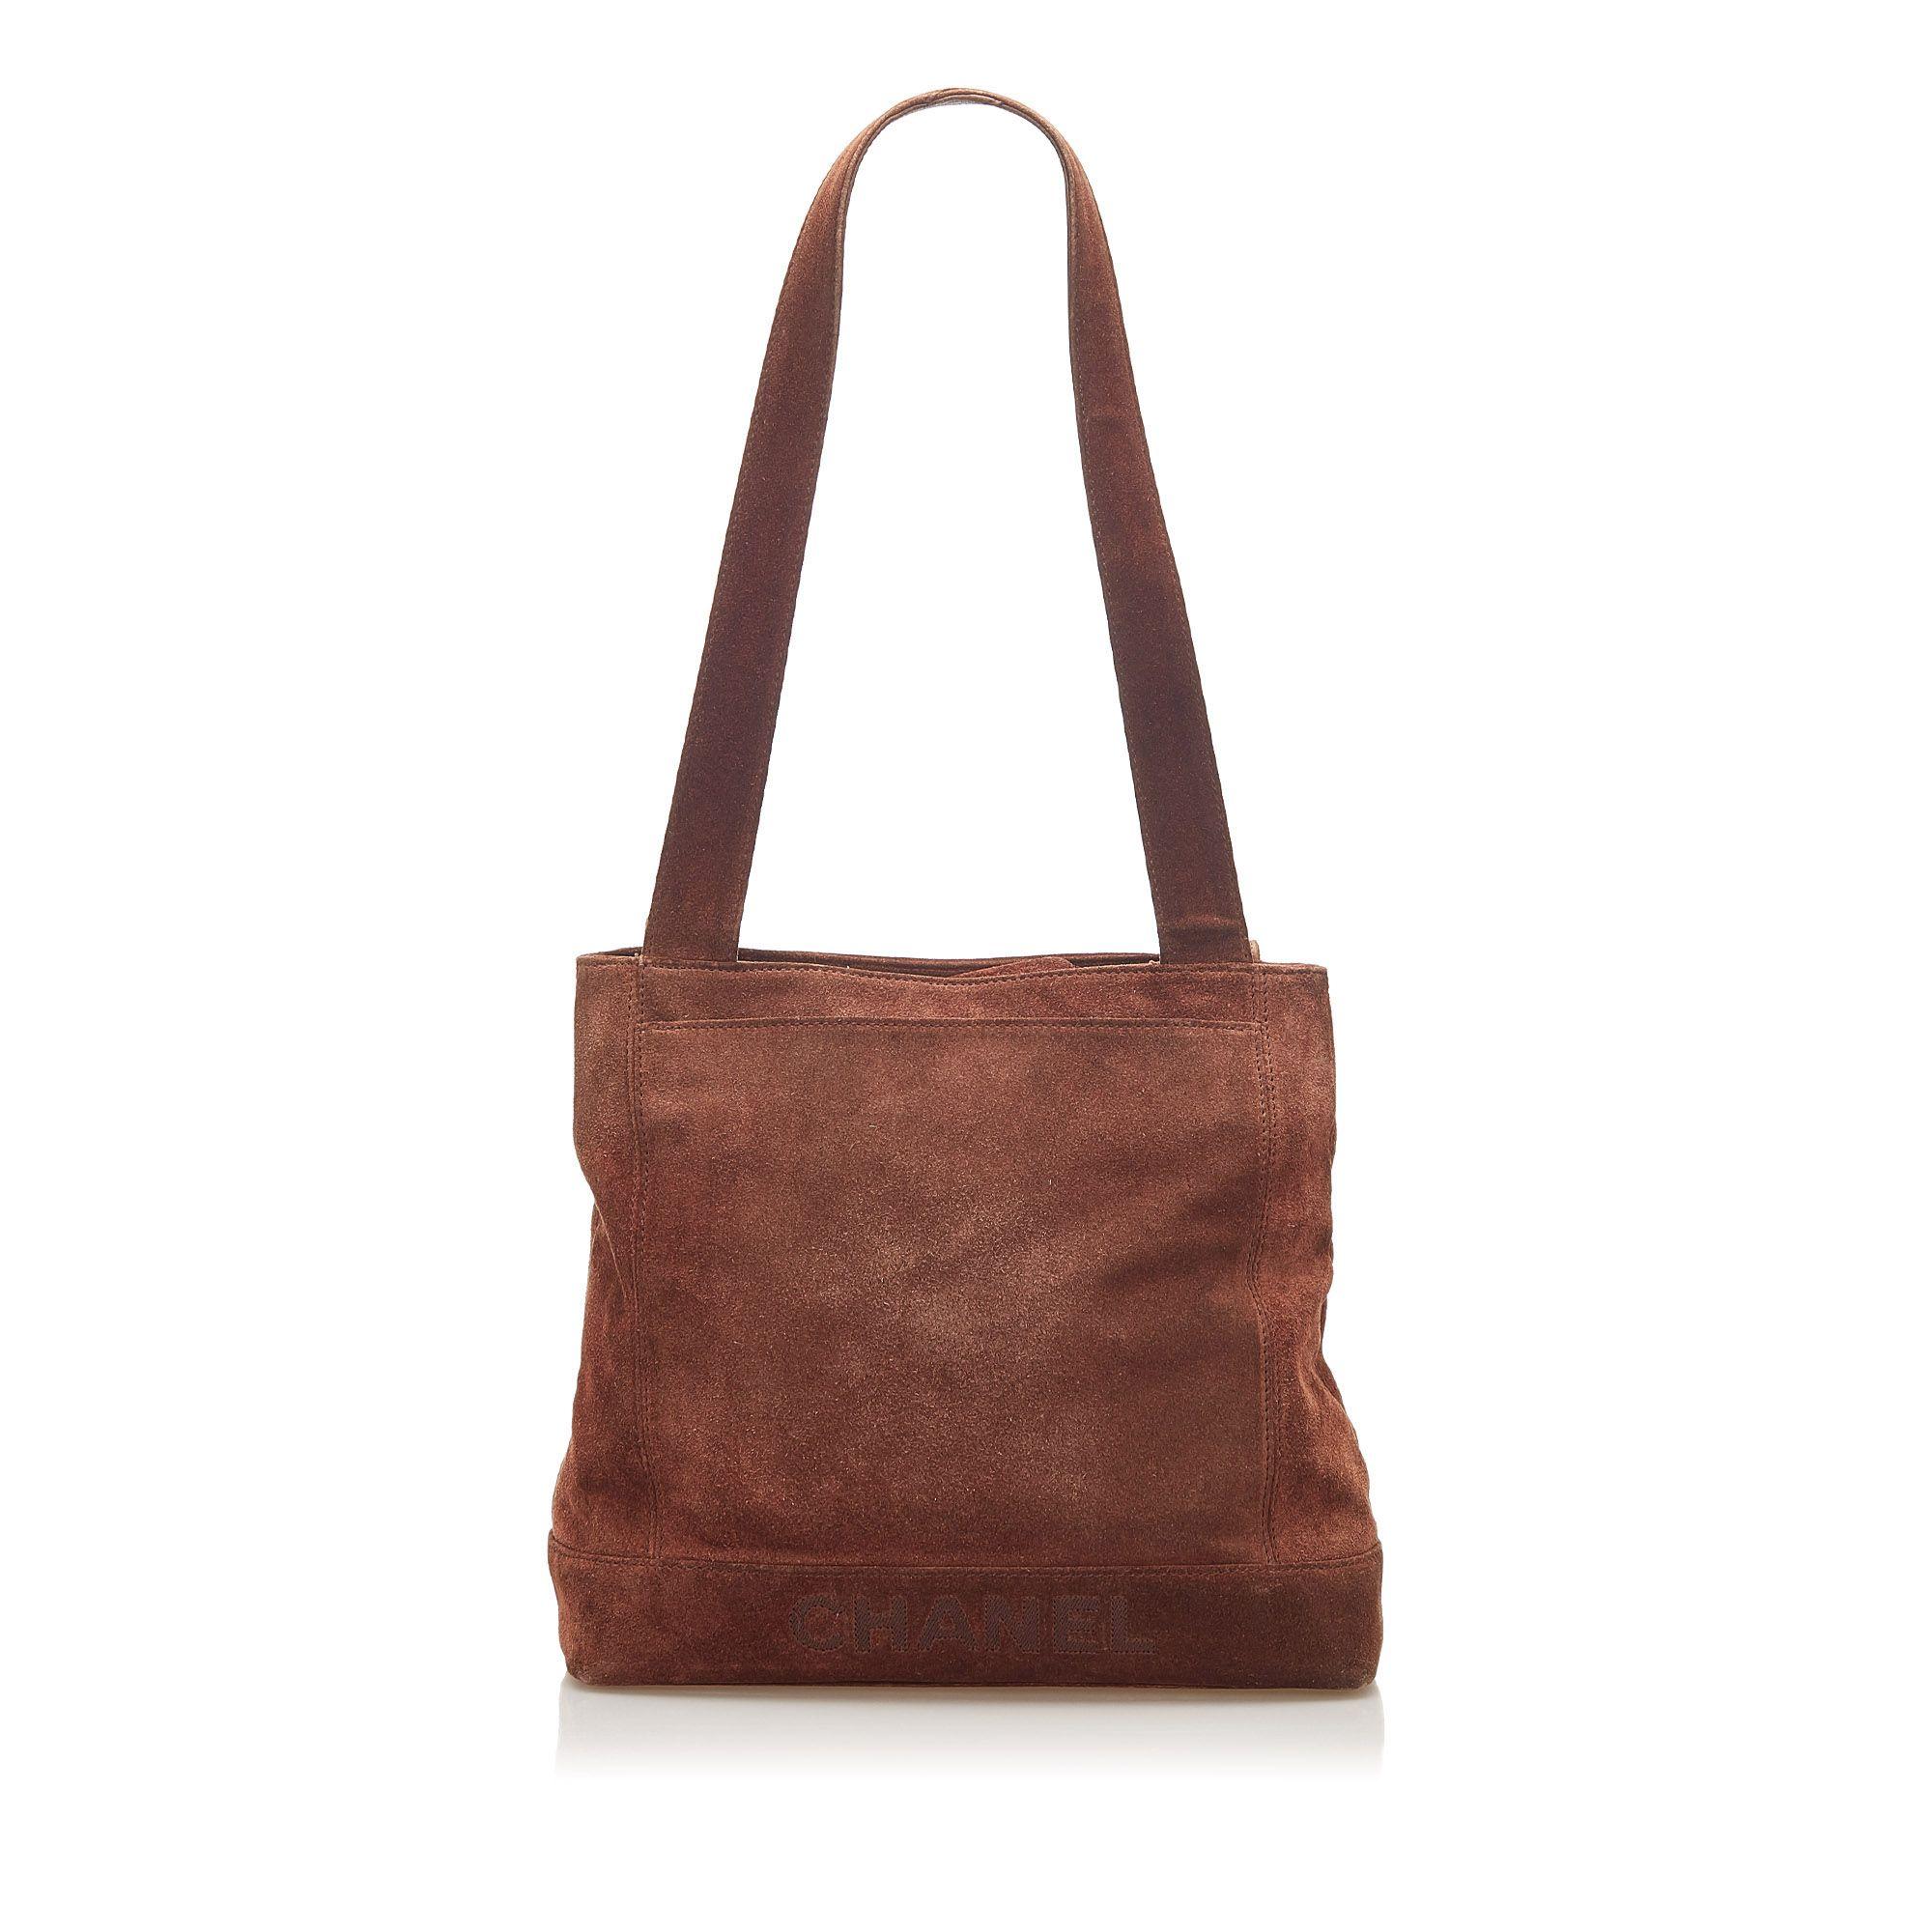 Vintage Chanel Suede Tote Bag Brown